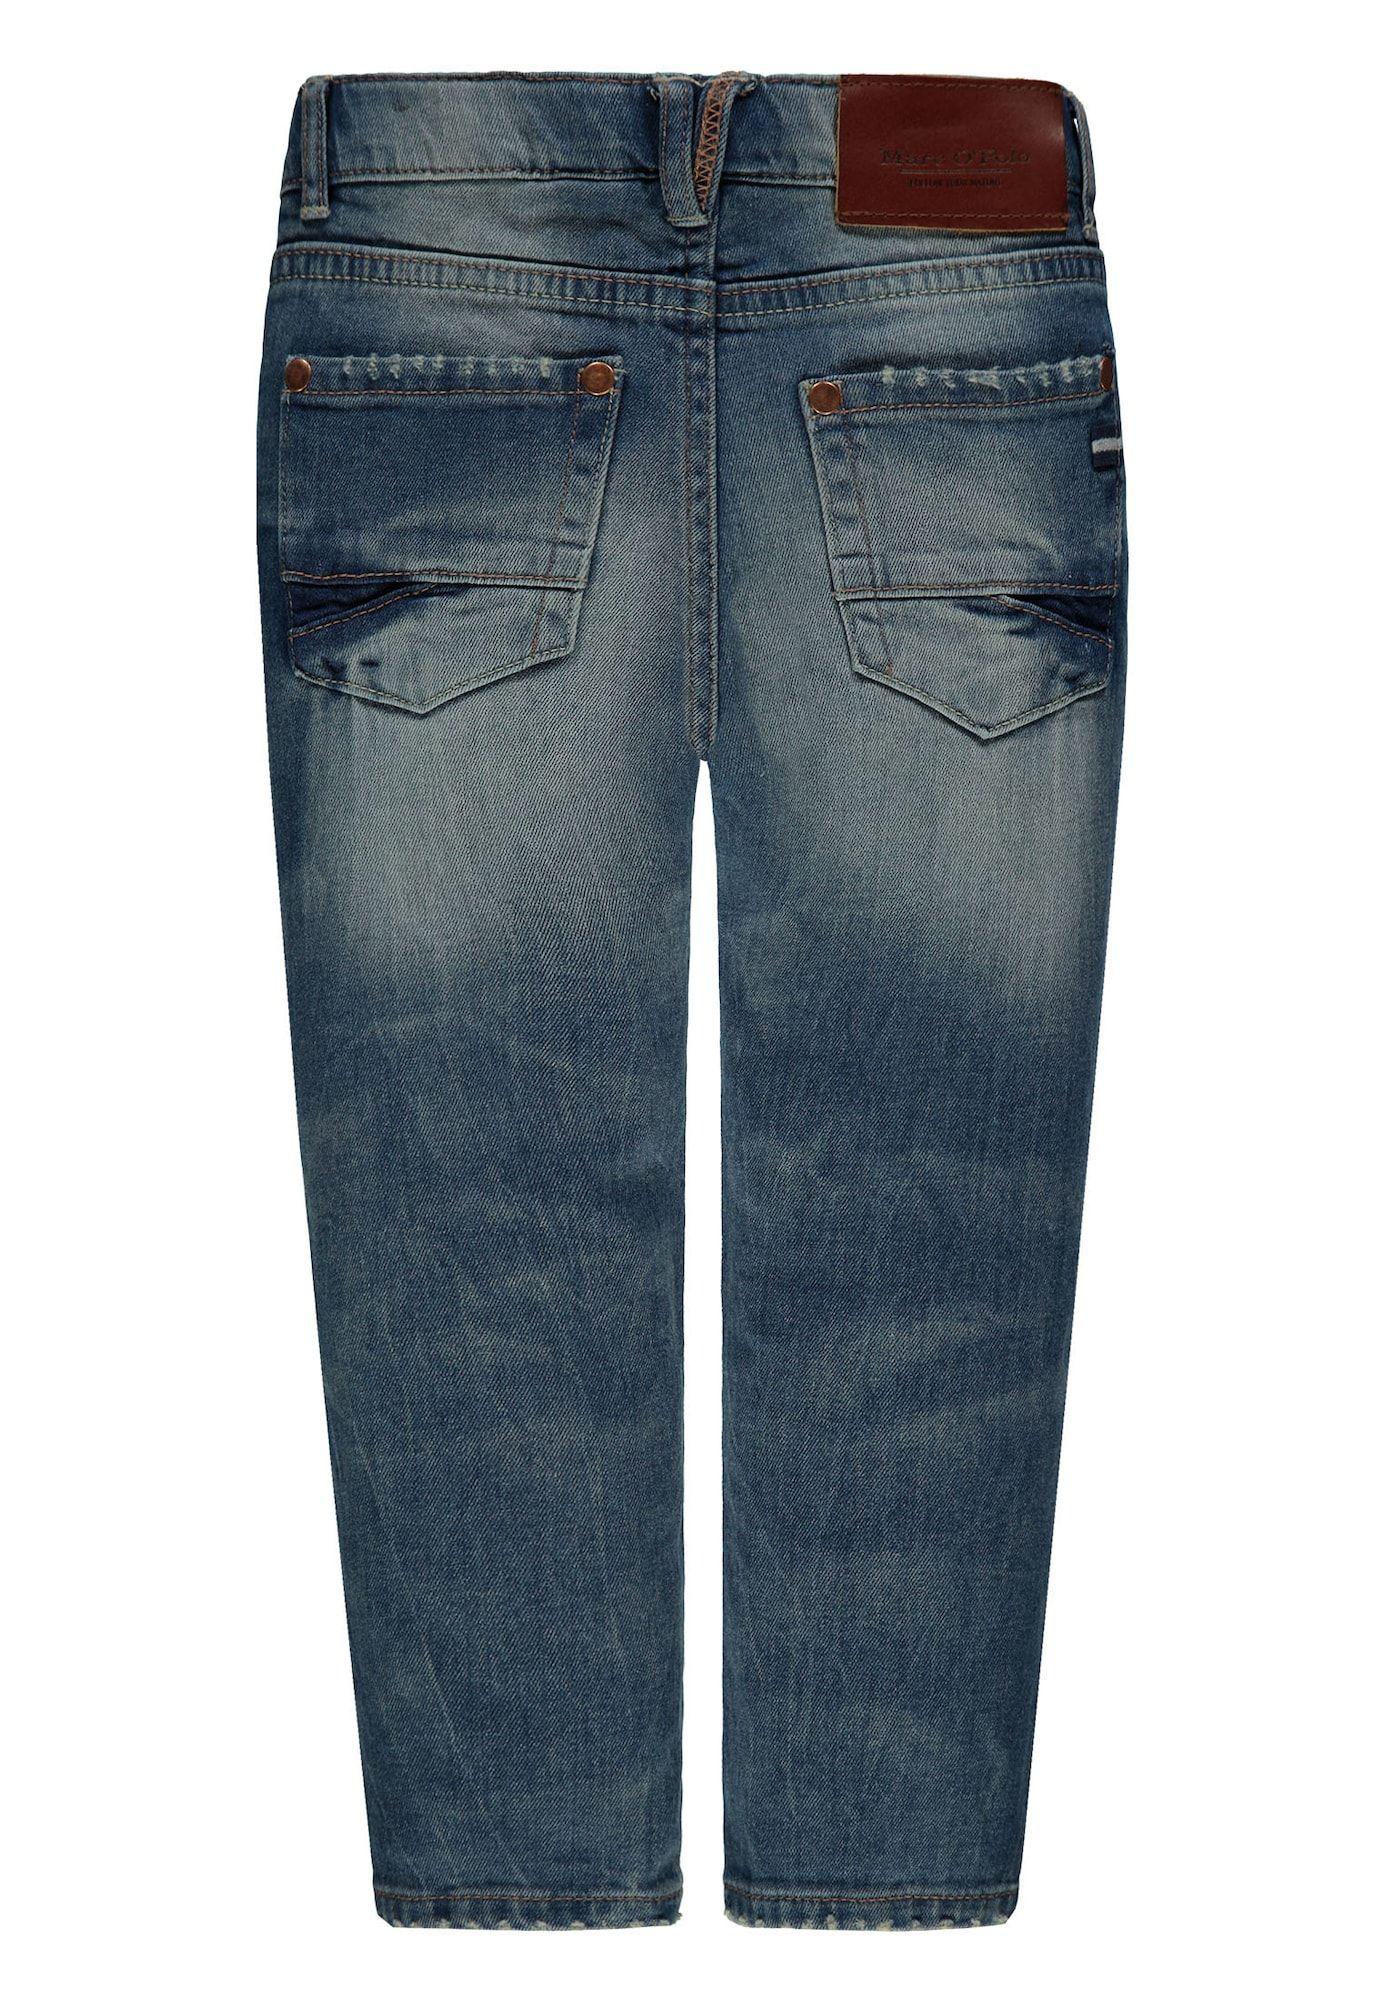 Marc O Polo Kids Jungen Jeanshose Jeans